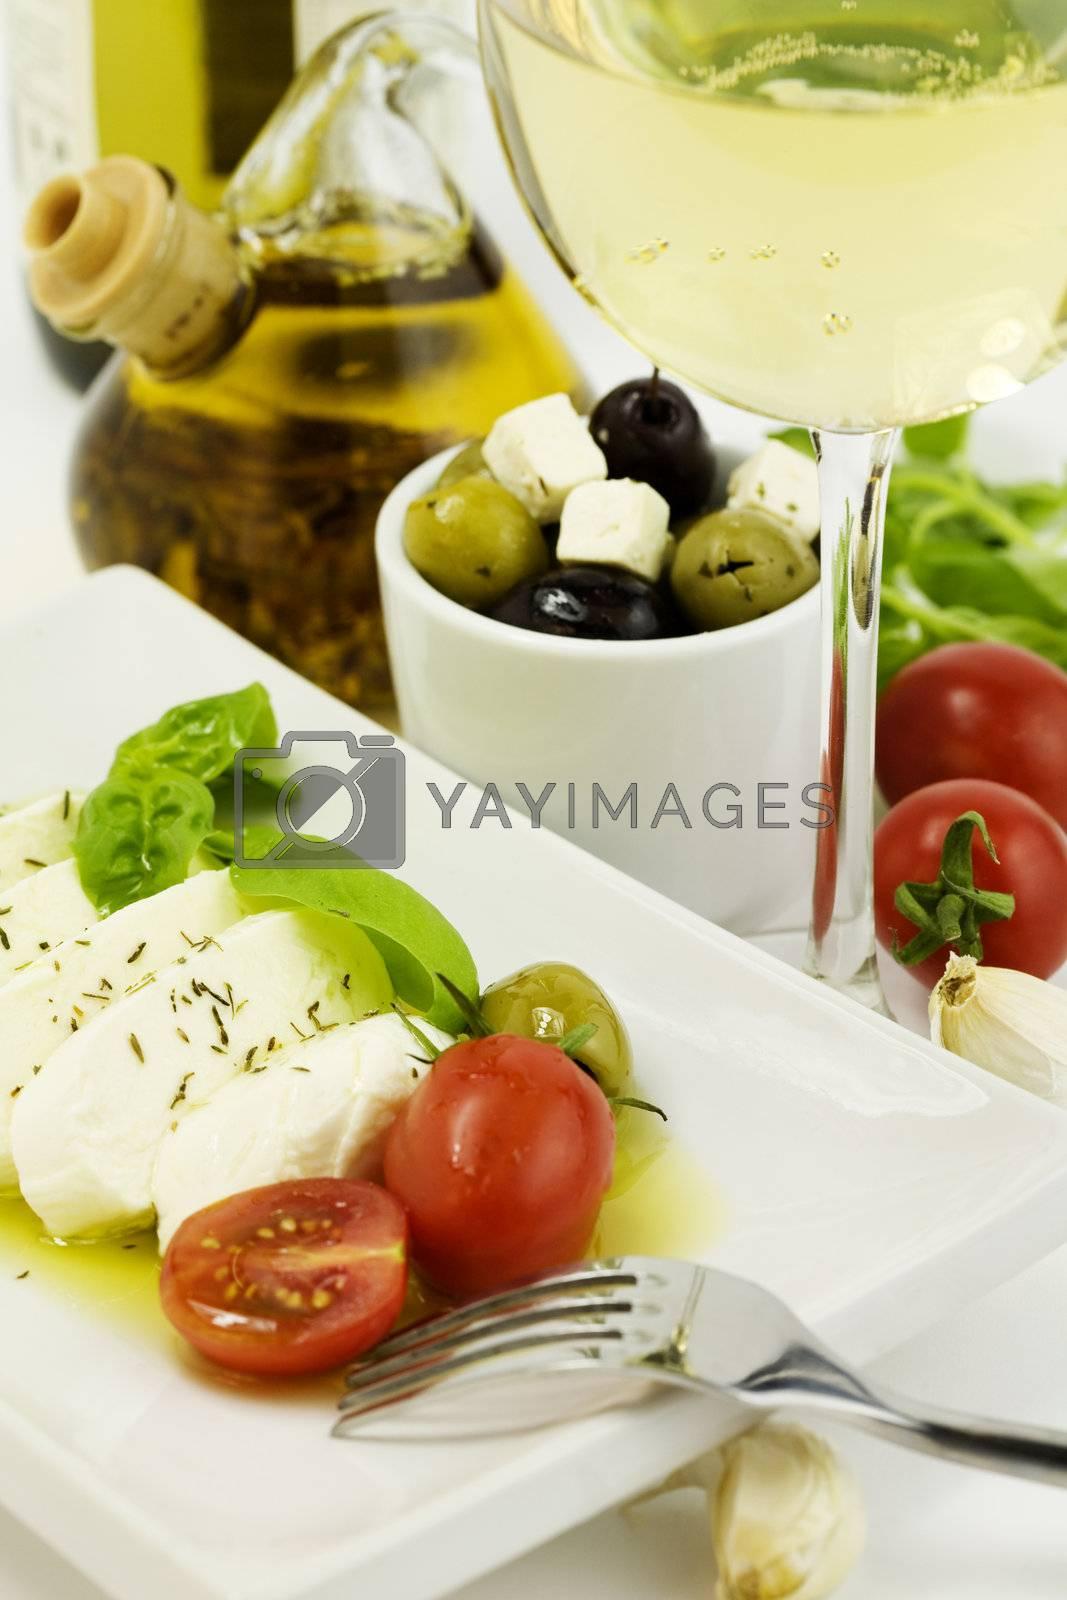 Italian cuisine by klenova